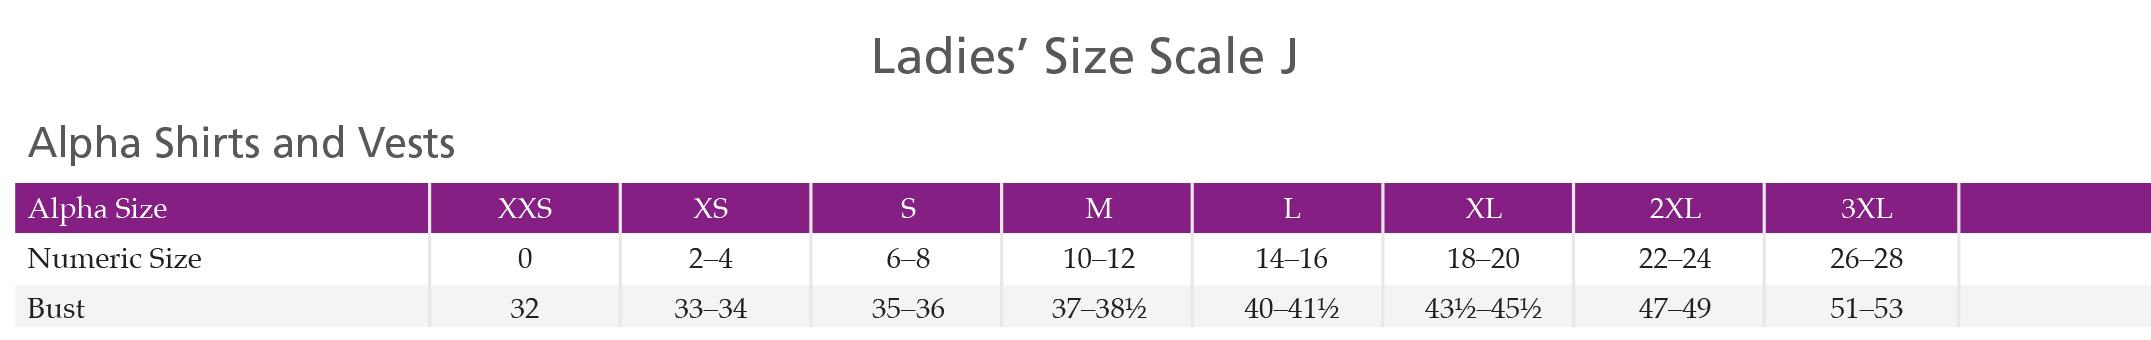 size-scale-j.jpg